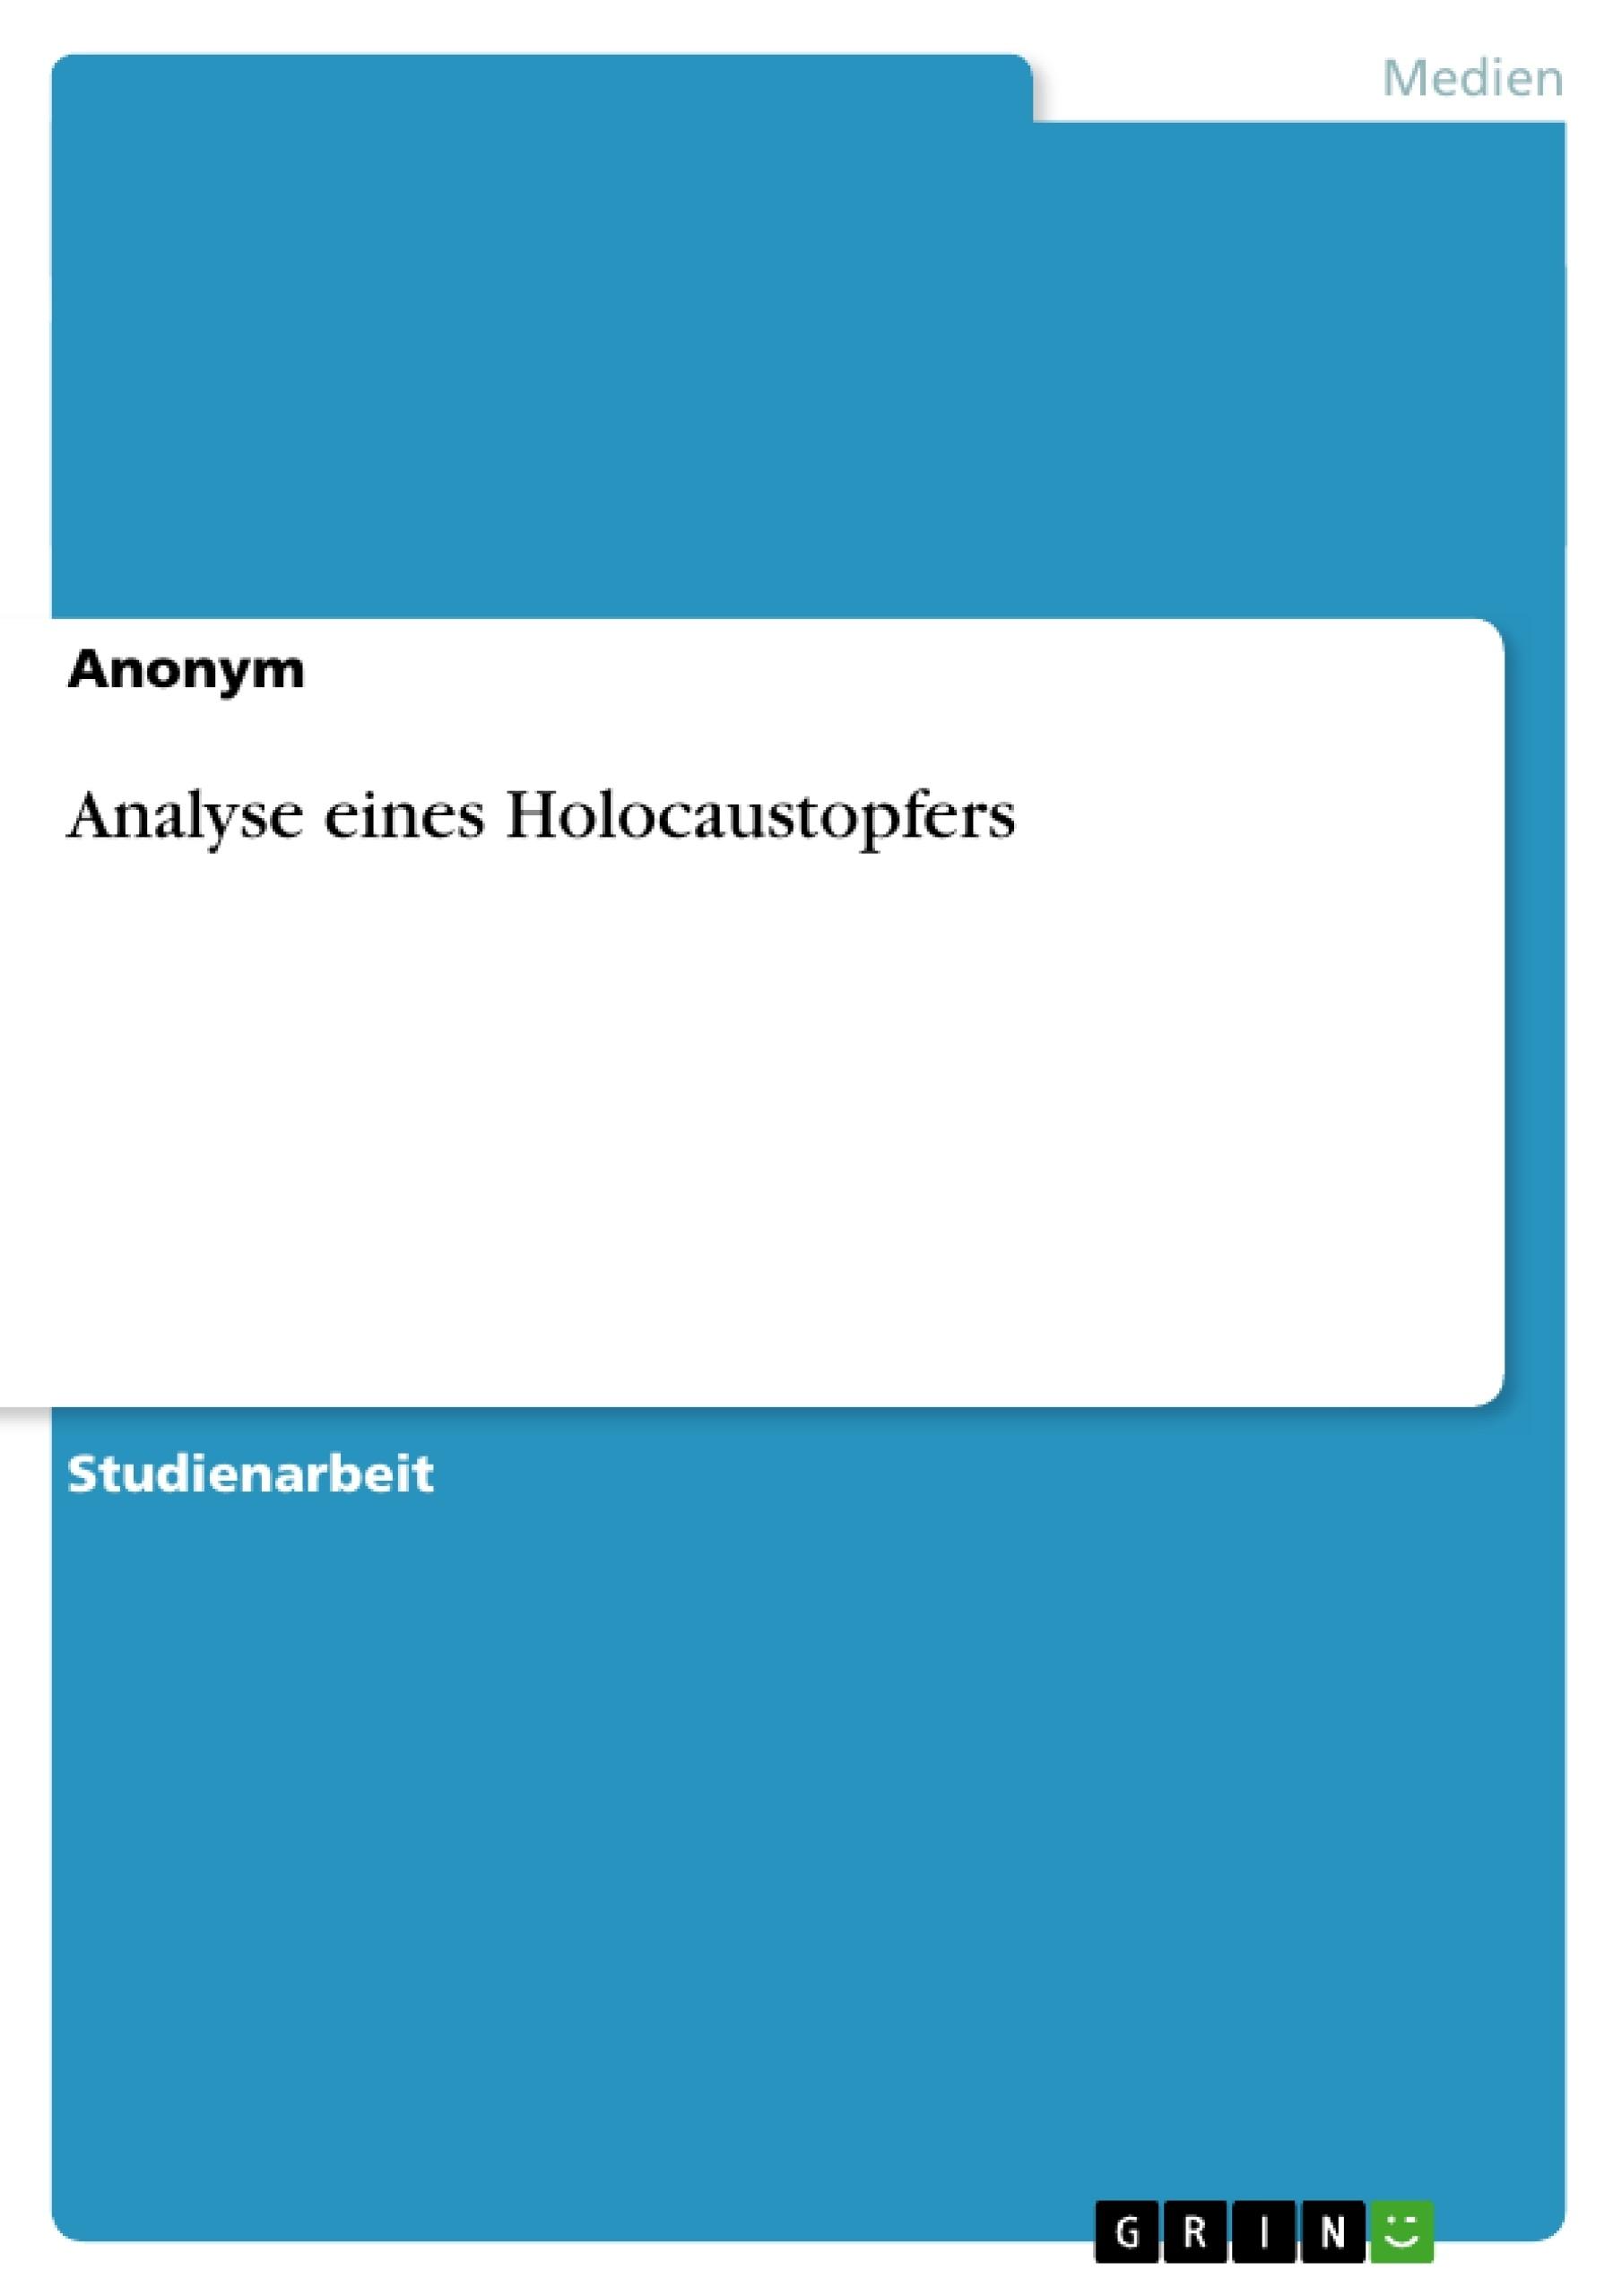 Titel: Analyse eines Holocaustopfers